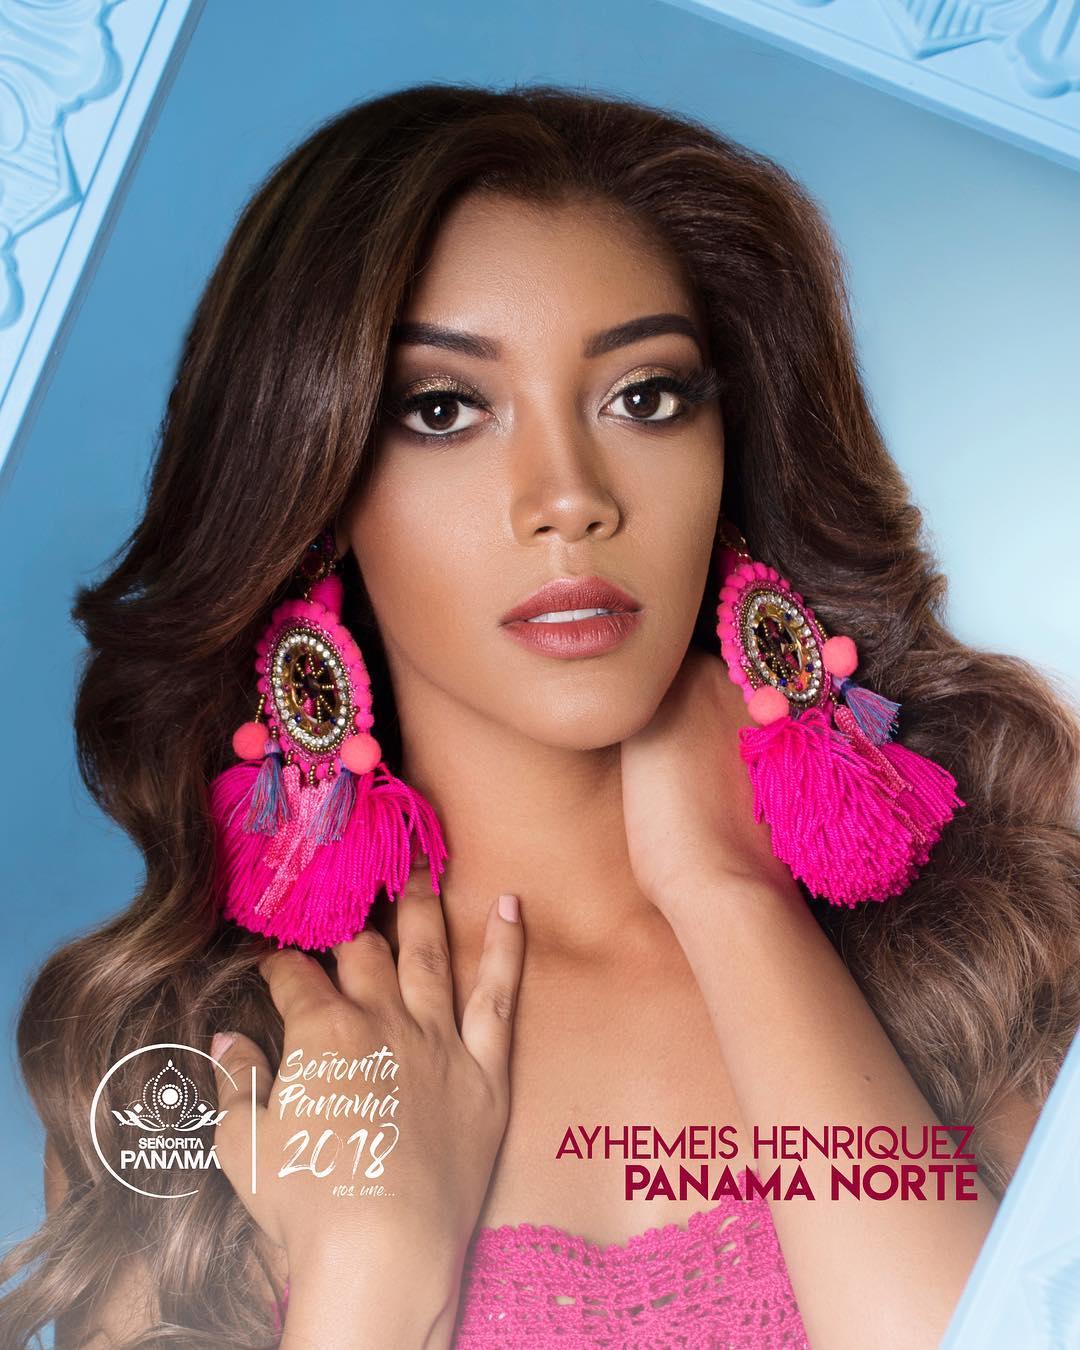 señorita miss colombia 2018 candidates candidatas contestants delegates Miss Panamá Norte Ayhemis Henríquez